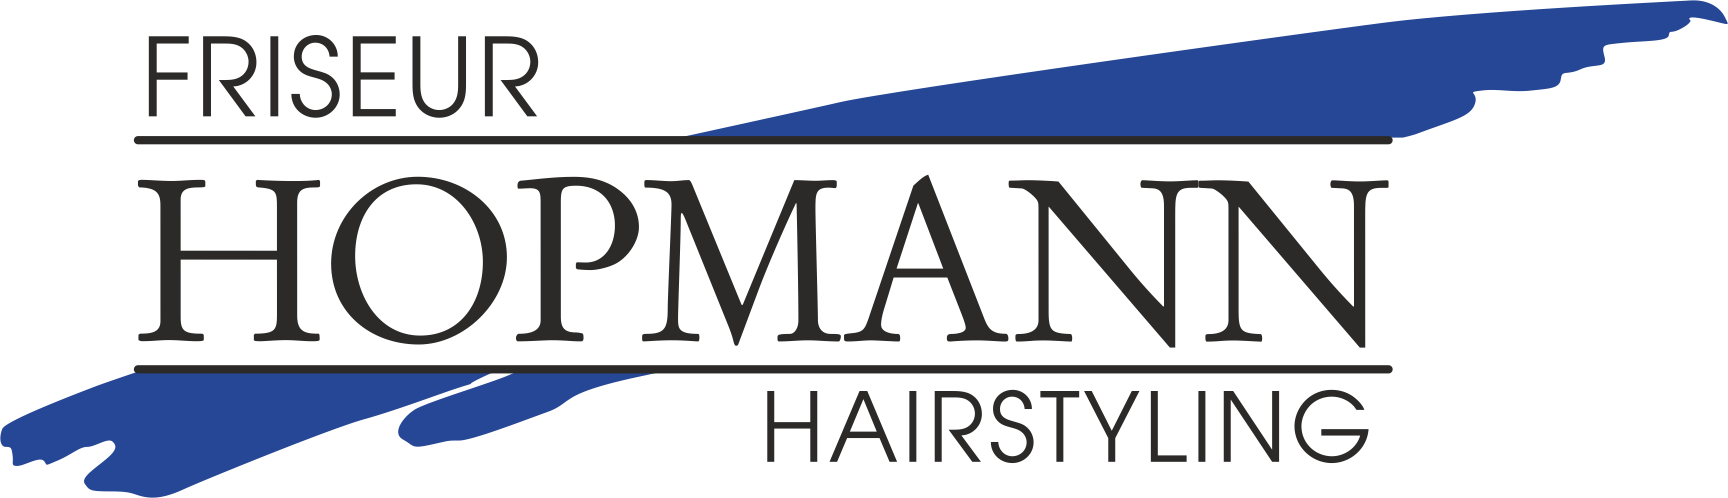 Friseur Hopmann Hairstyling